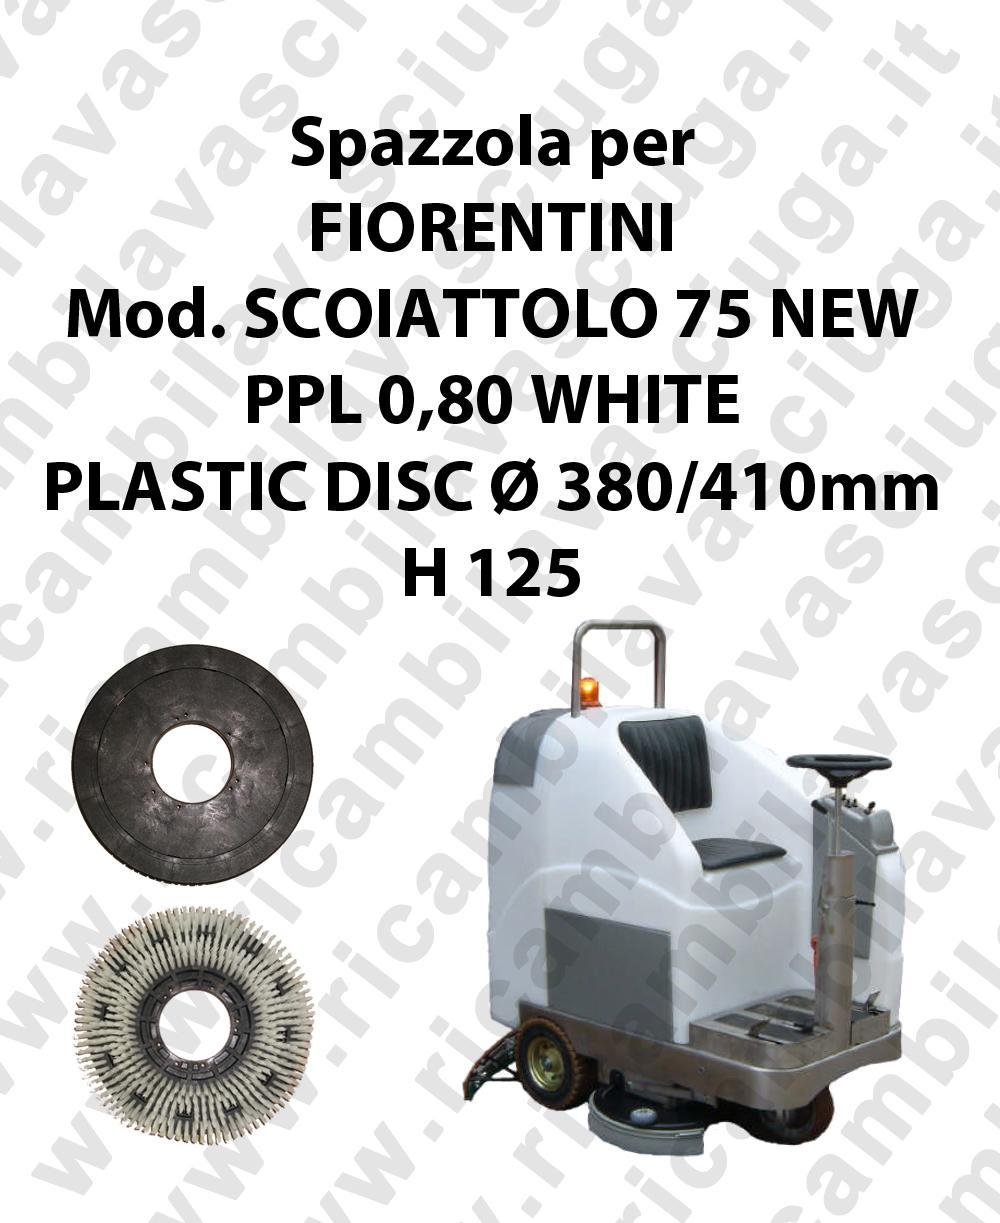 CEPILLO DE LAVADO PPL 0,80 WHITE para fregadora FIORENTINI modelo SCOIATTOLO 75 NEW